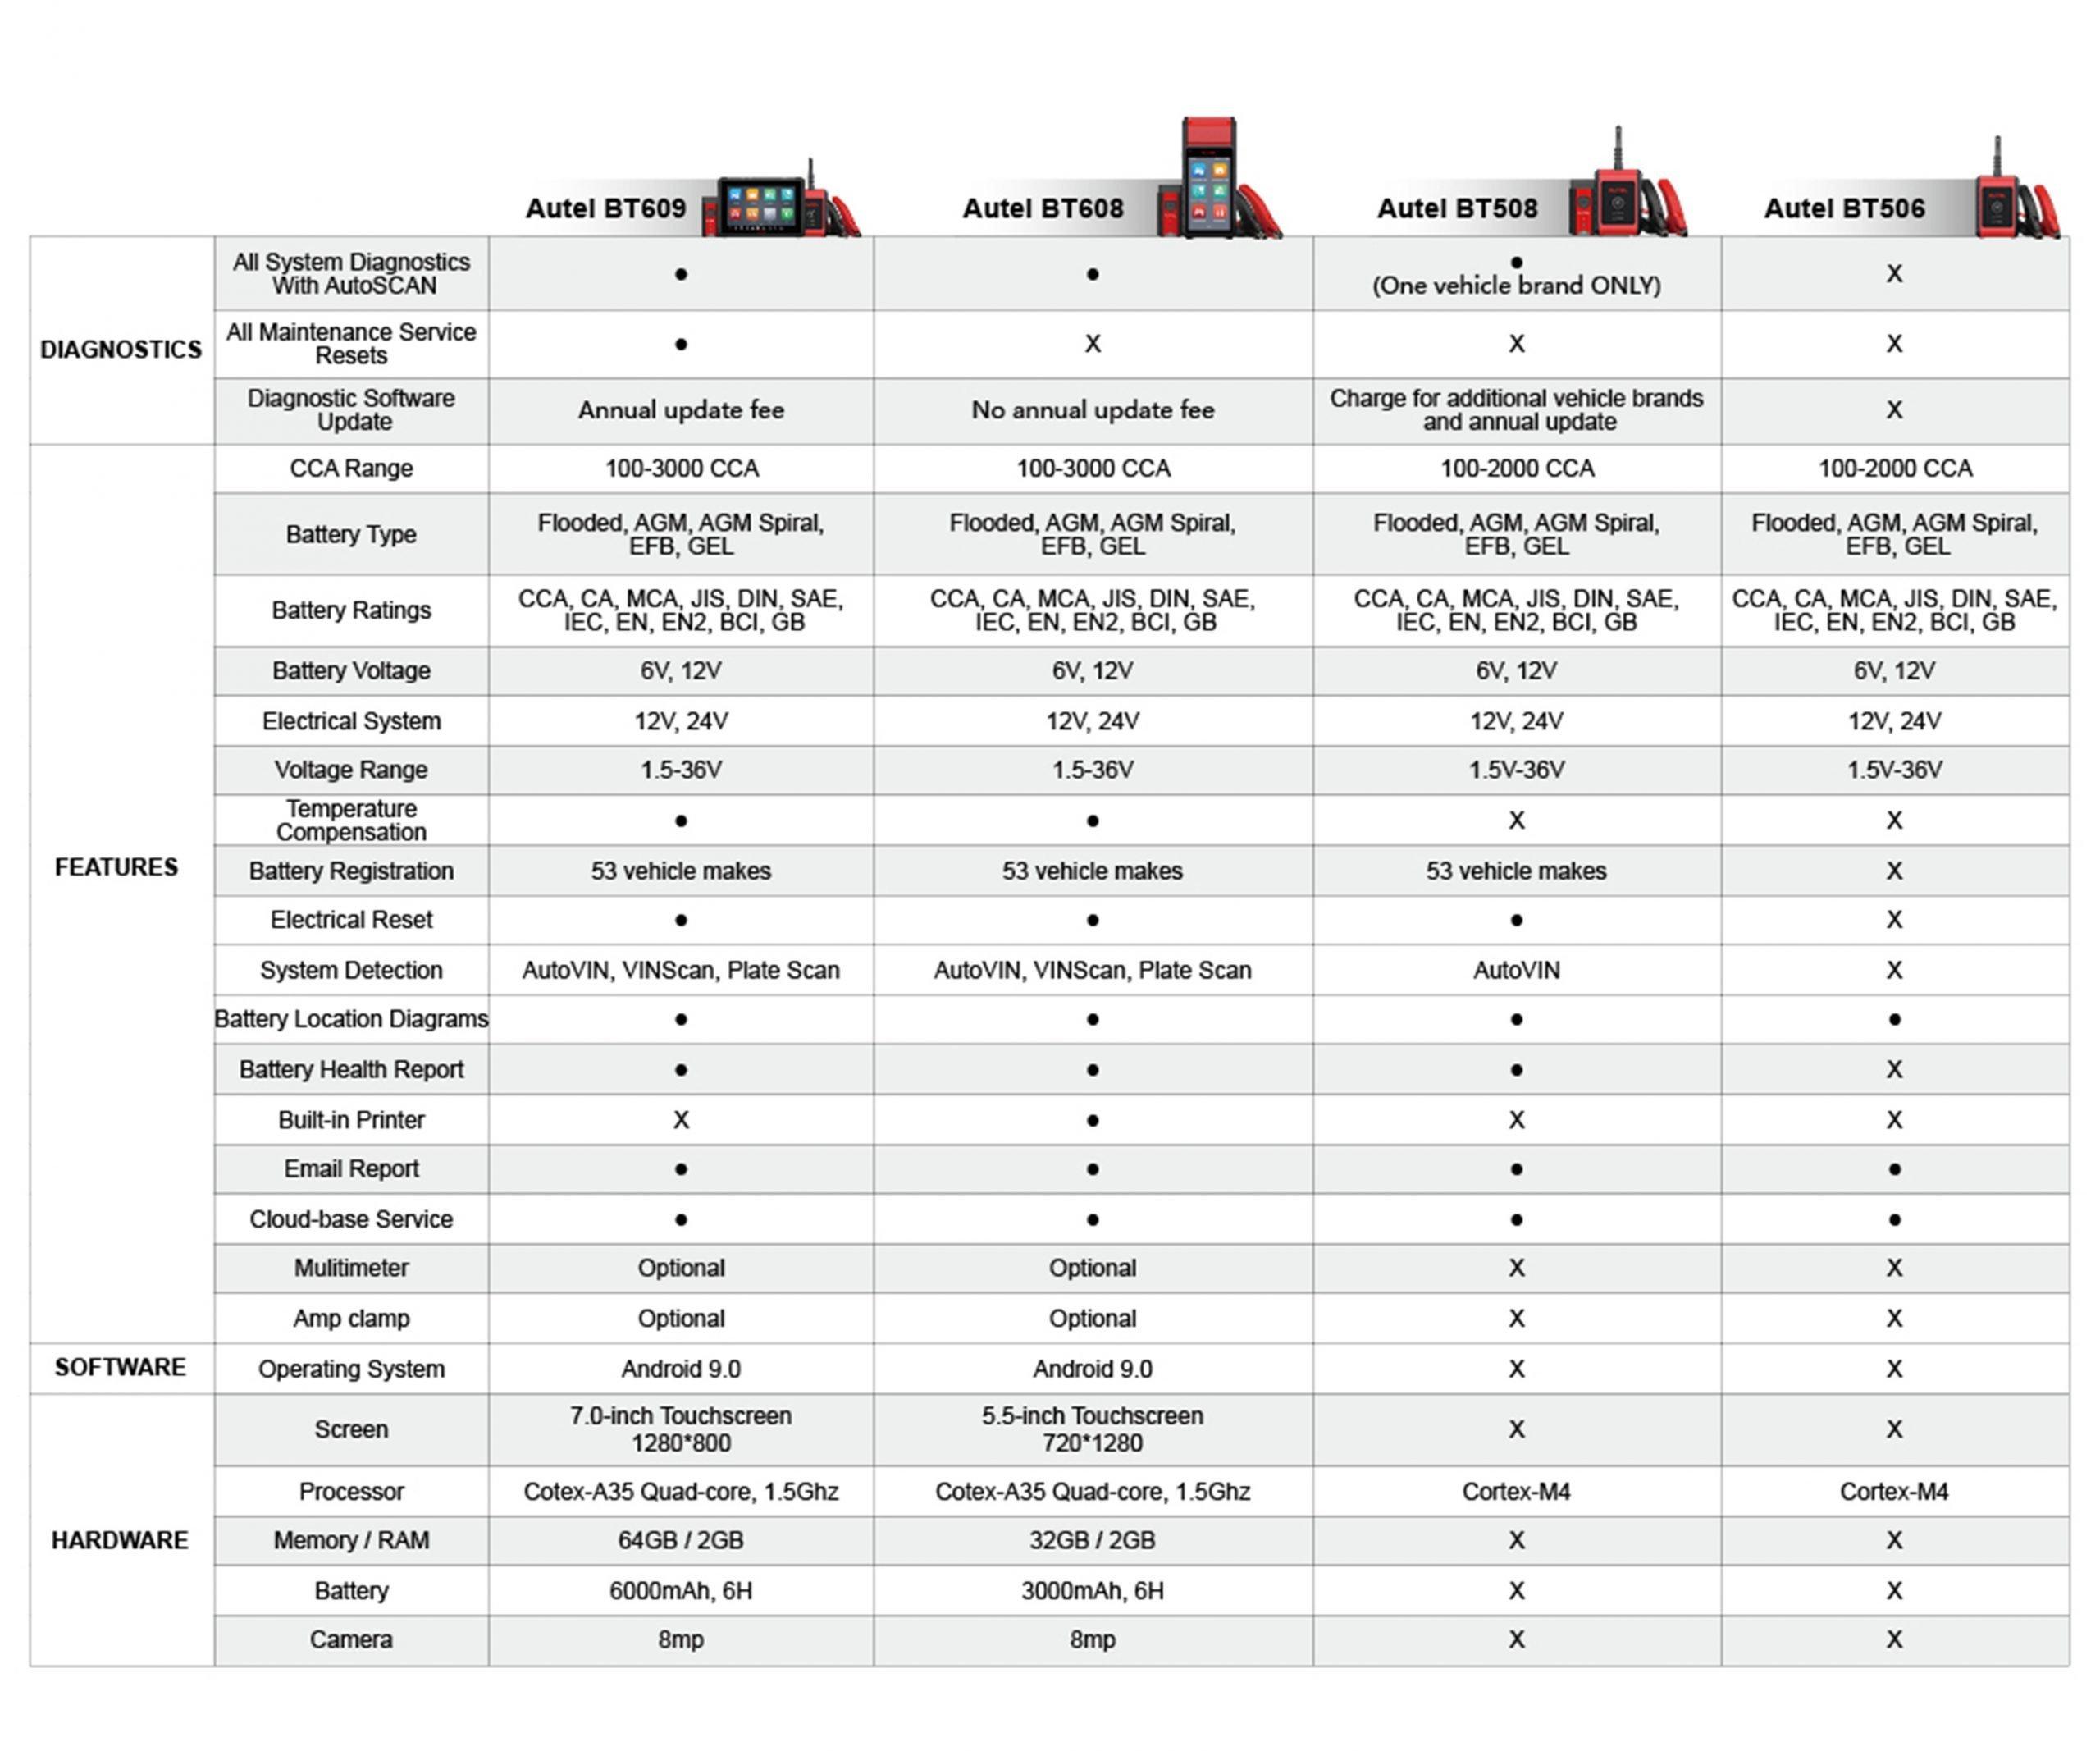 maxibas-comparison